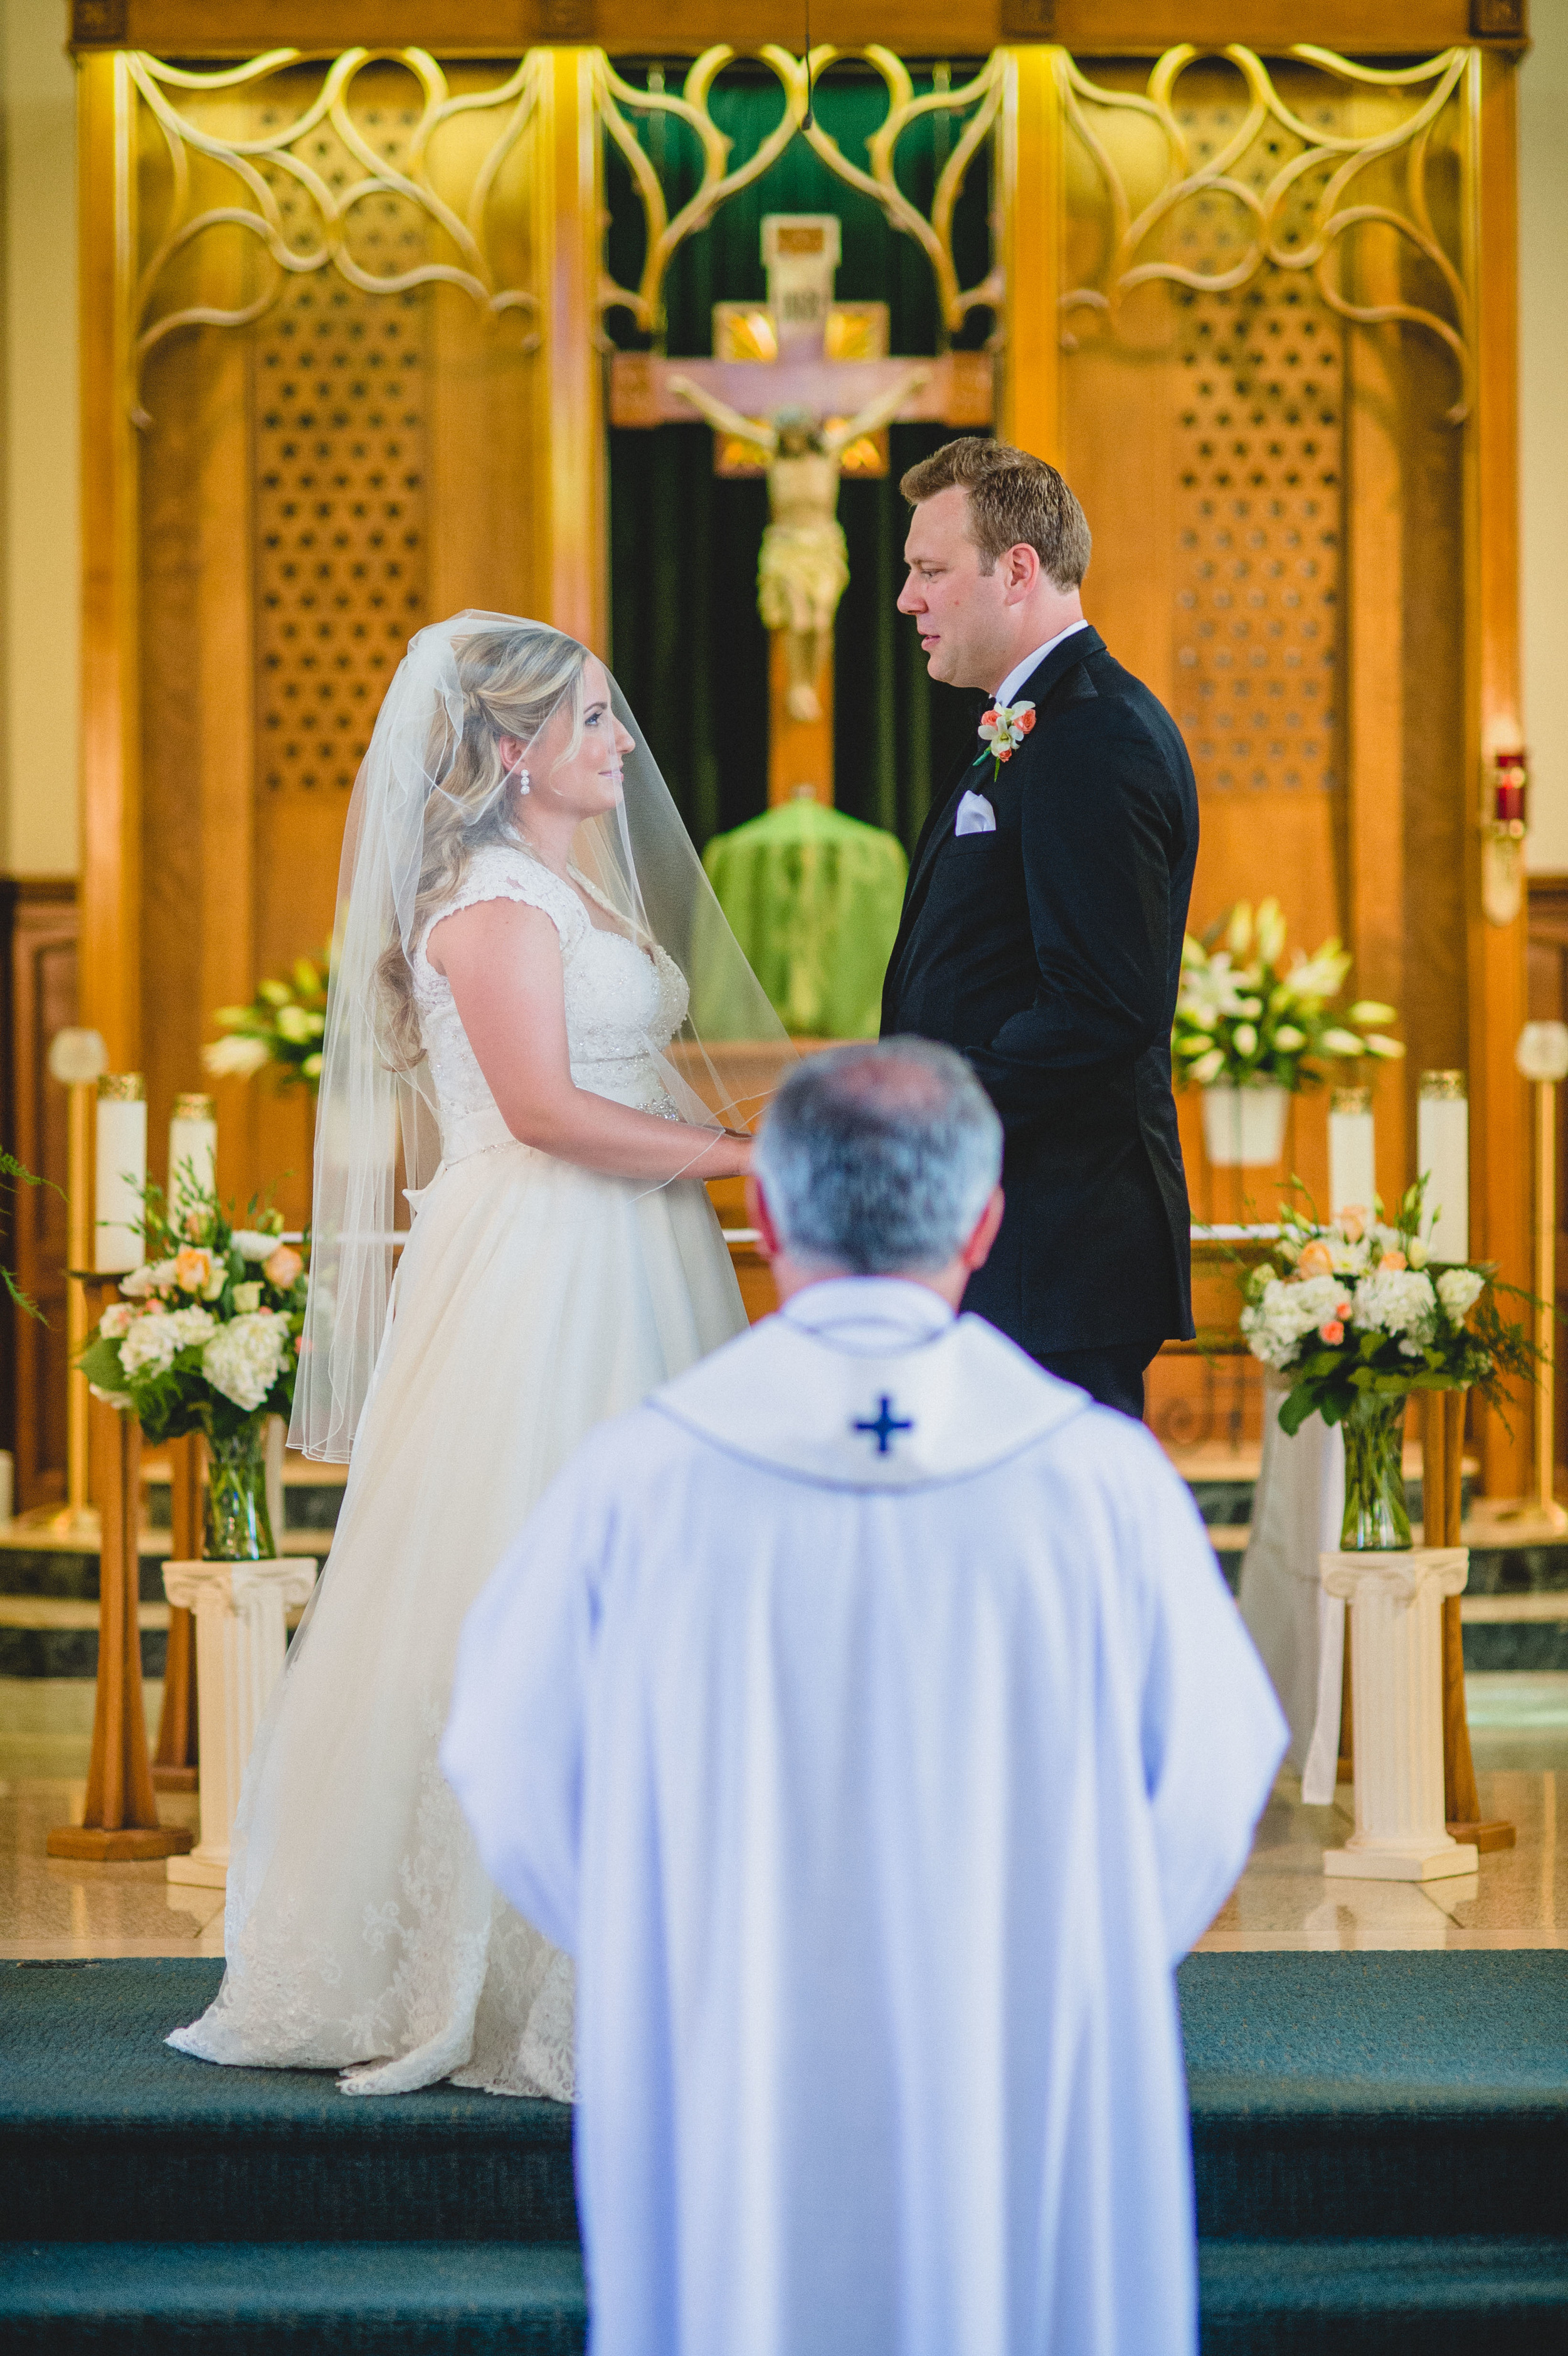 Vancouver St Augustine 's Church wedding photographer edward lai photography-43.jpg